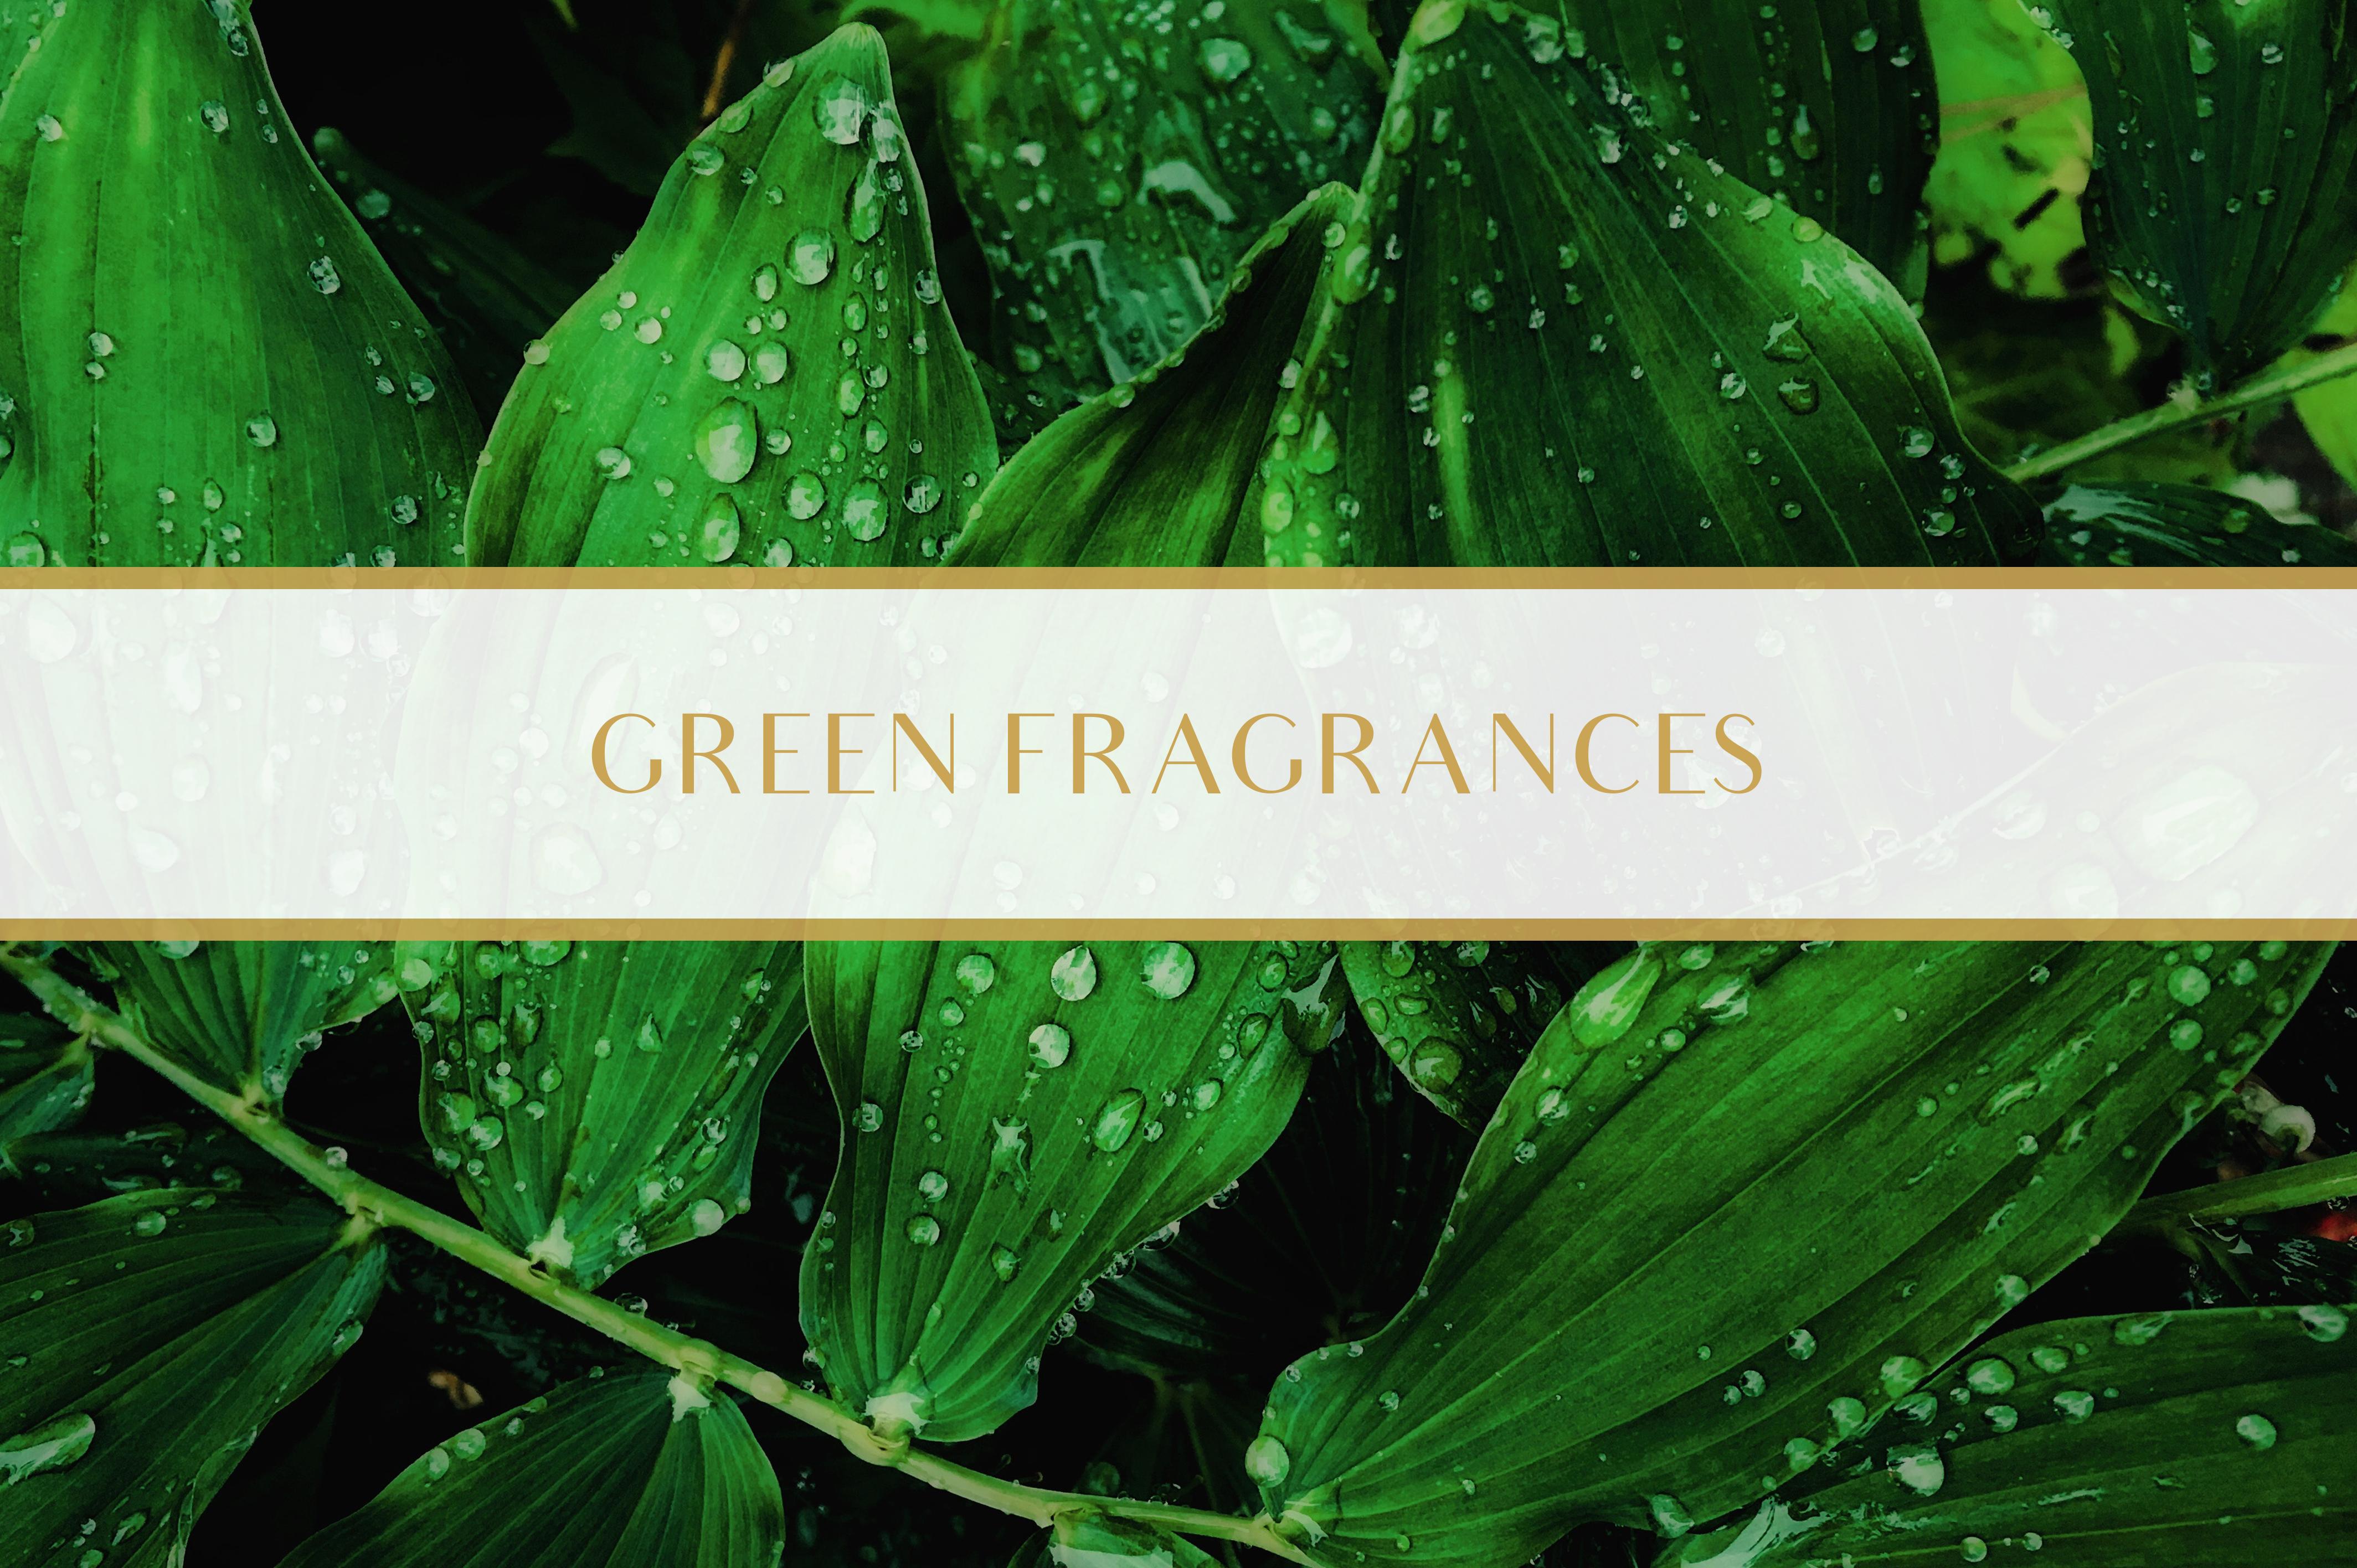 Green Fragrances